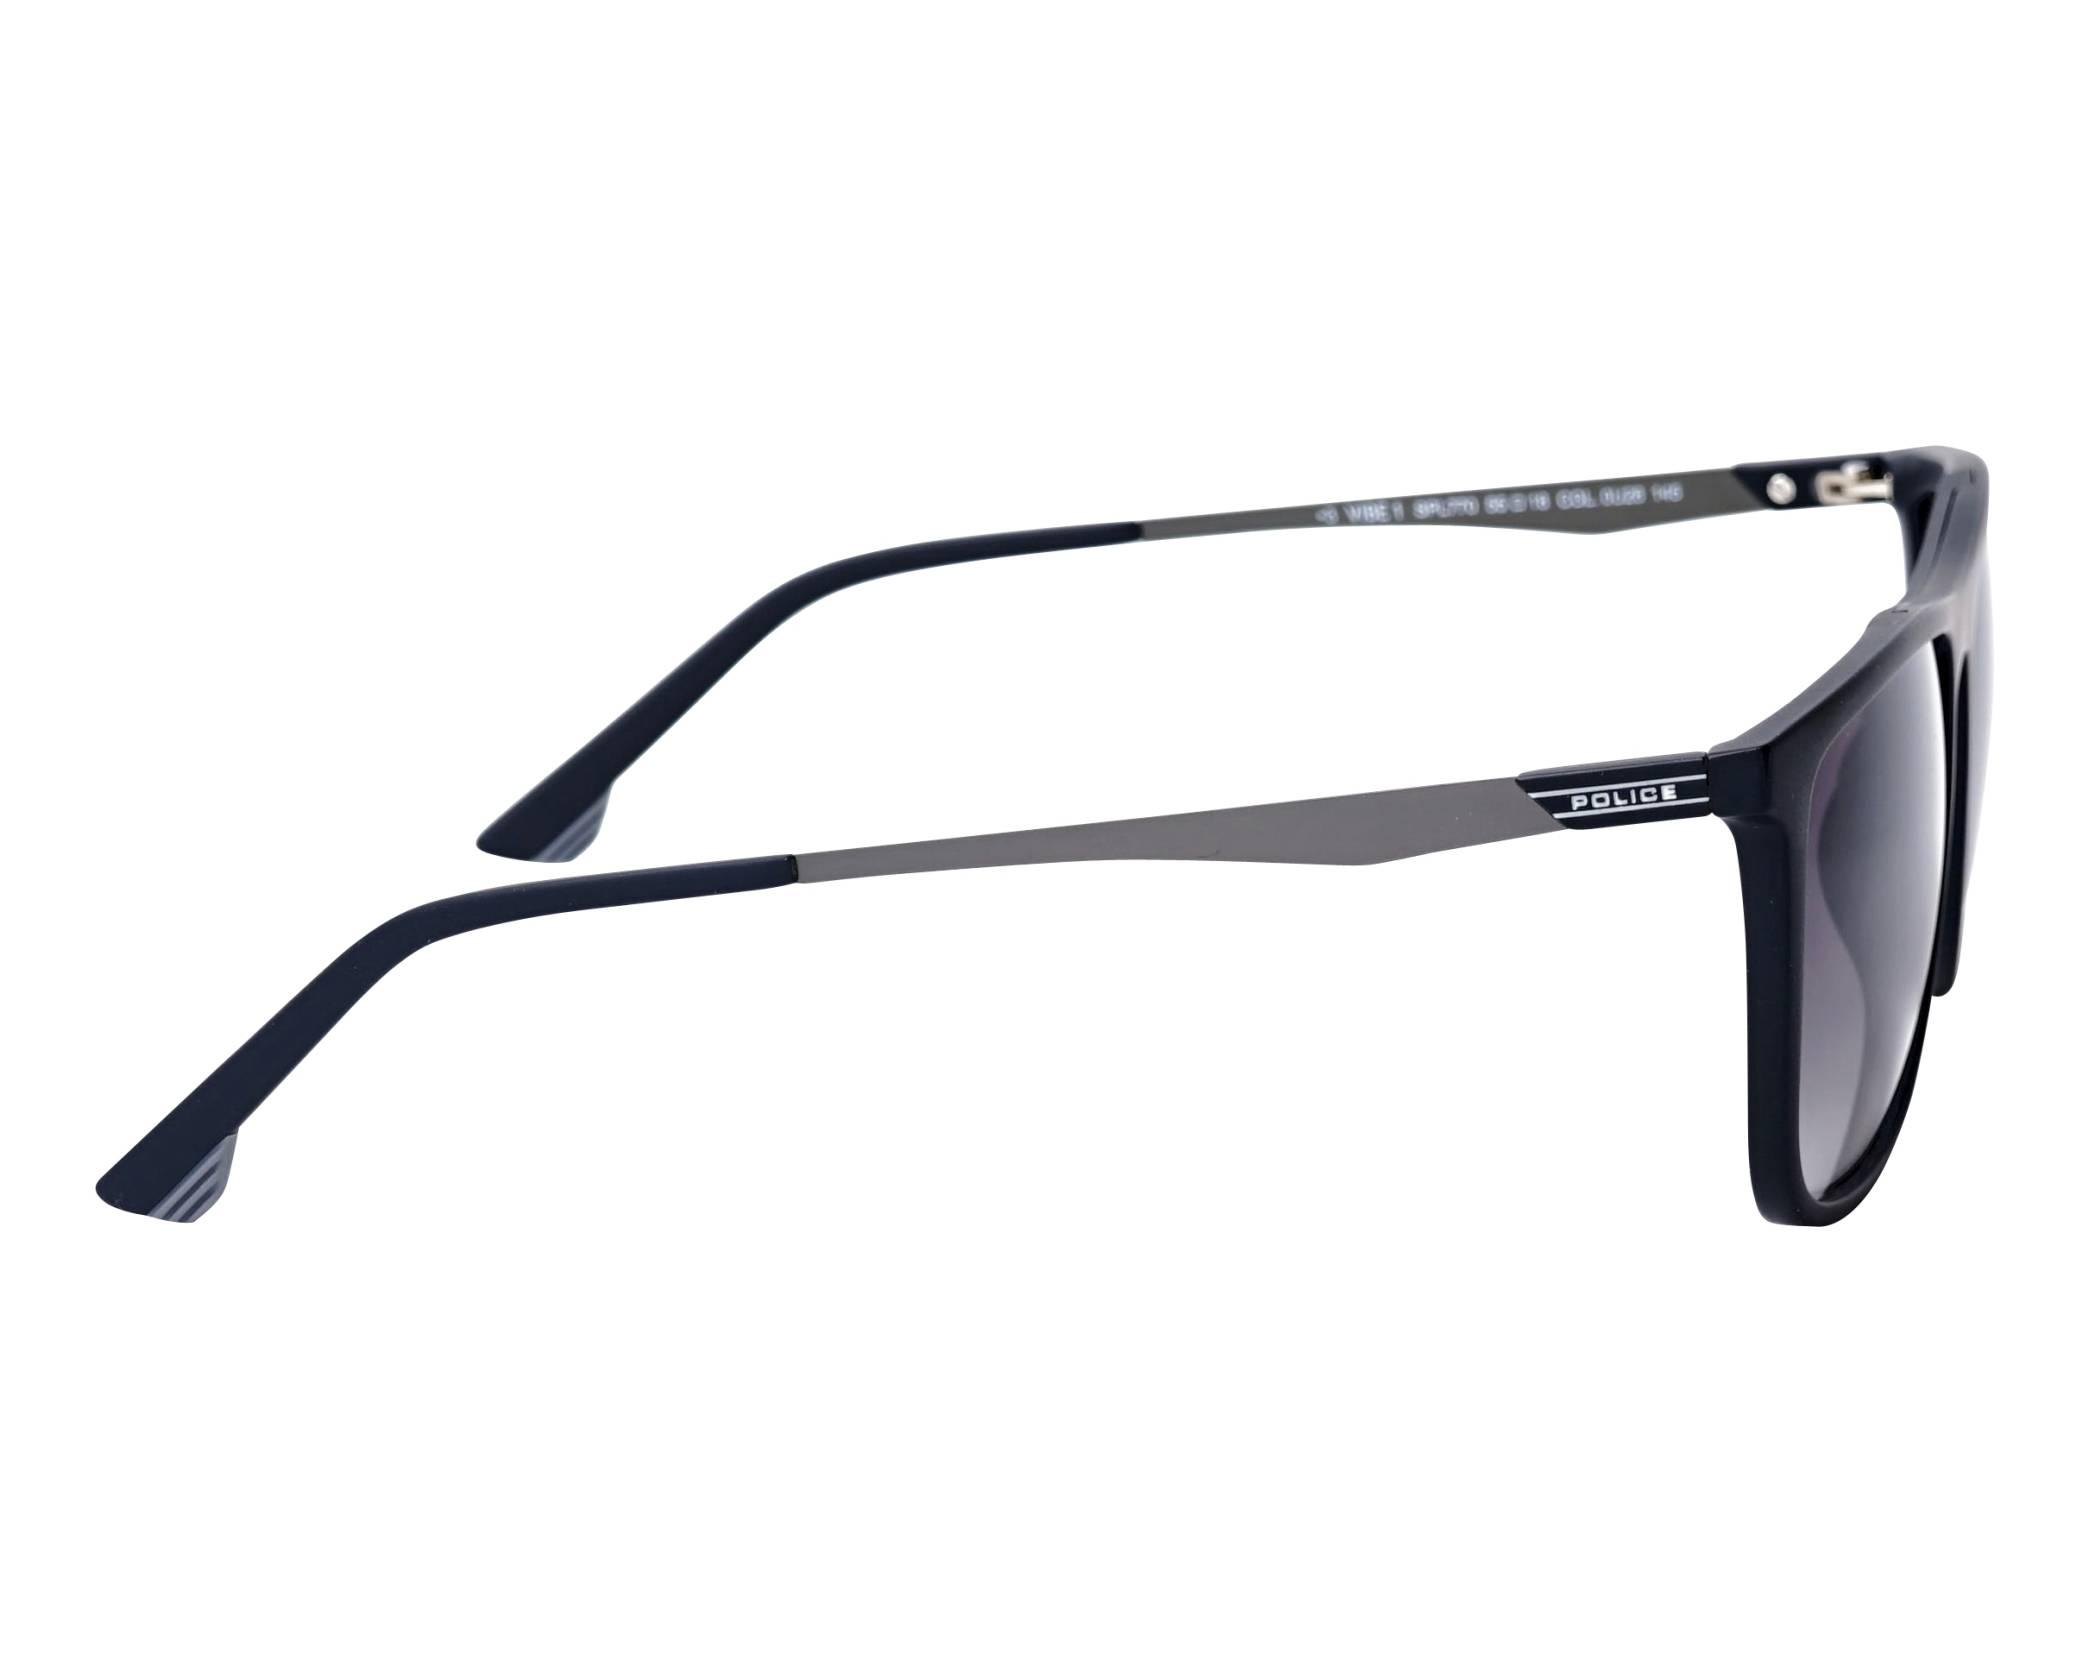 5afd870ffb Gafas de sol Police SPL-770 0U28 55-18 Negra vista lateral